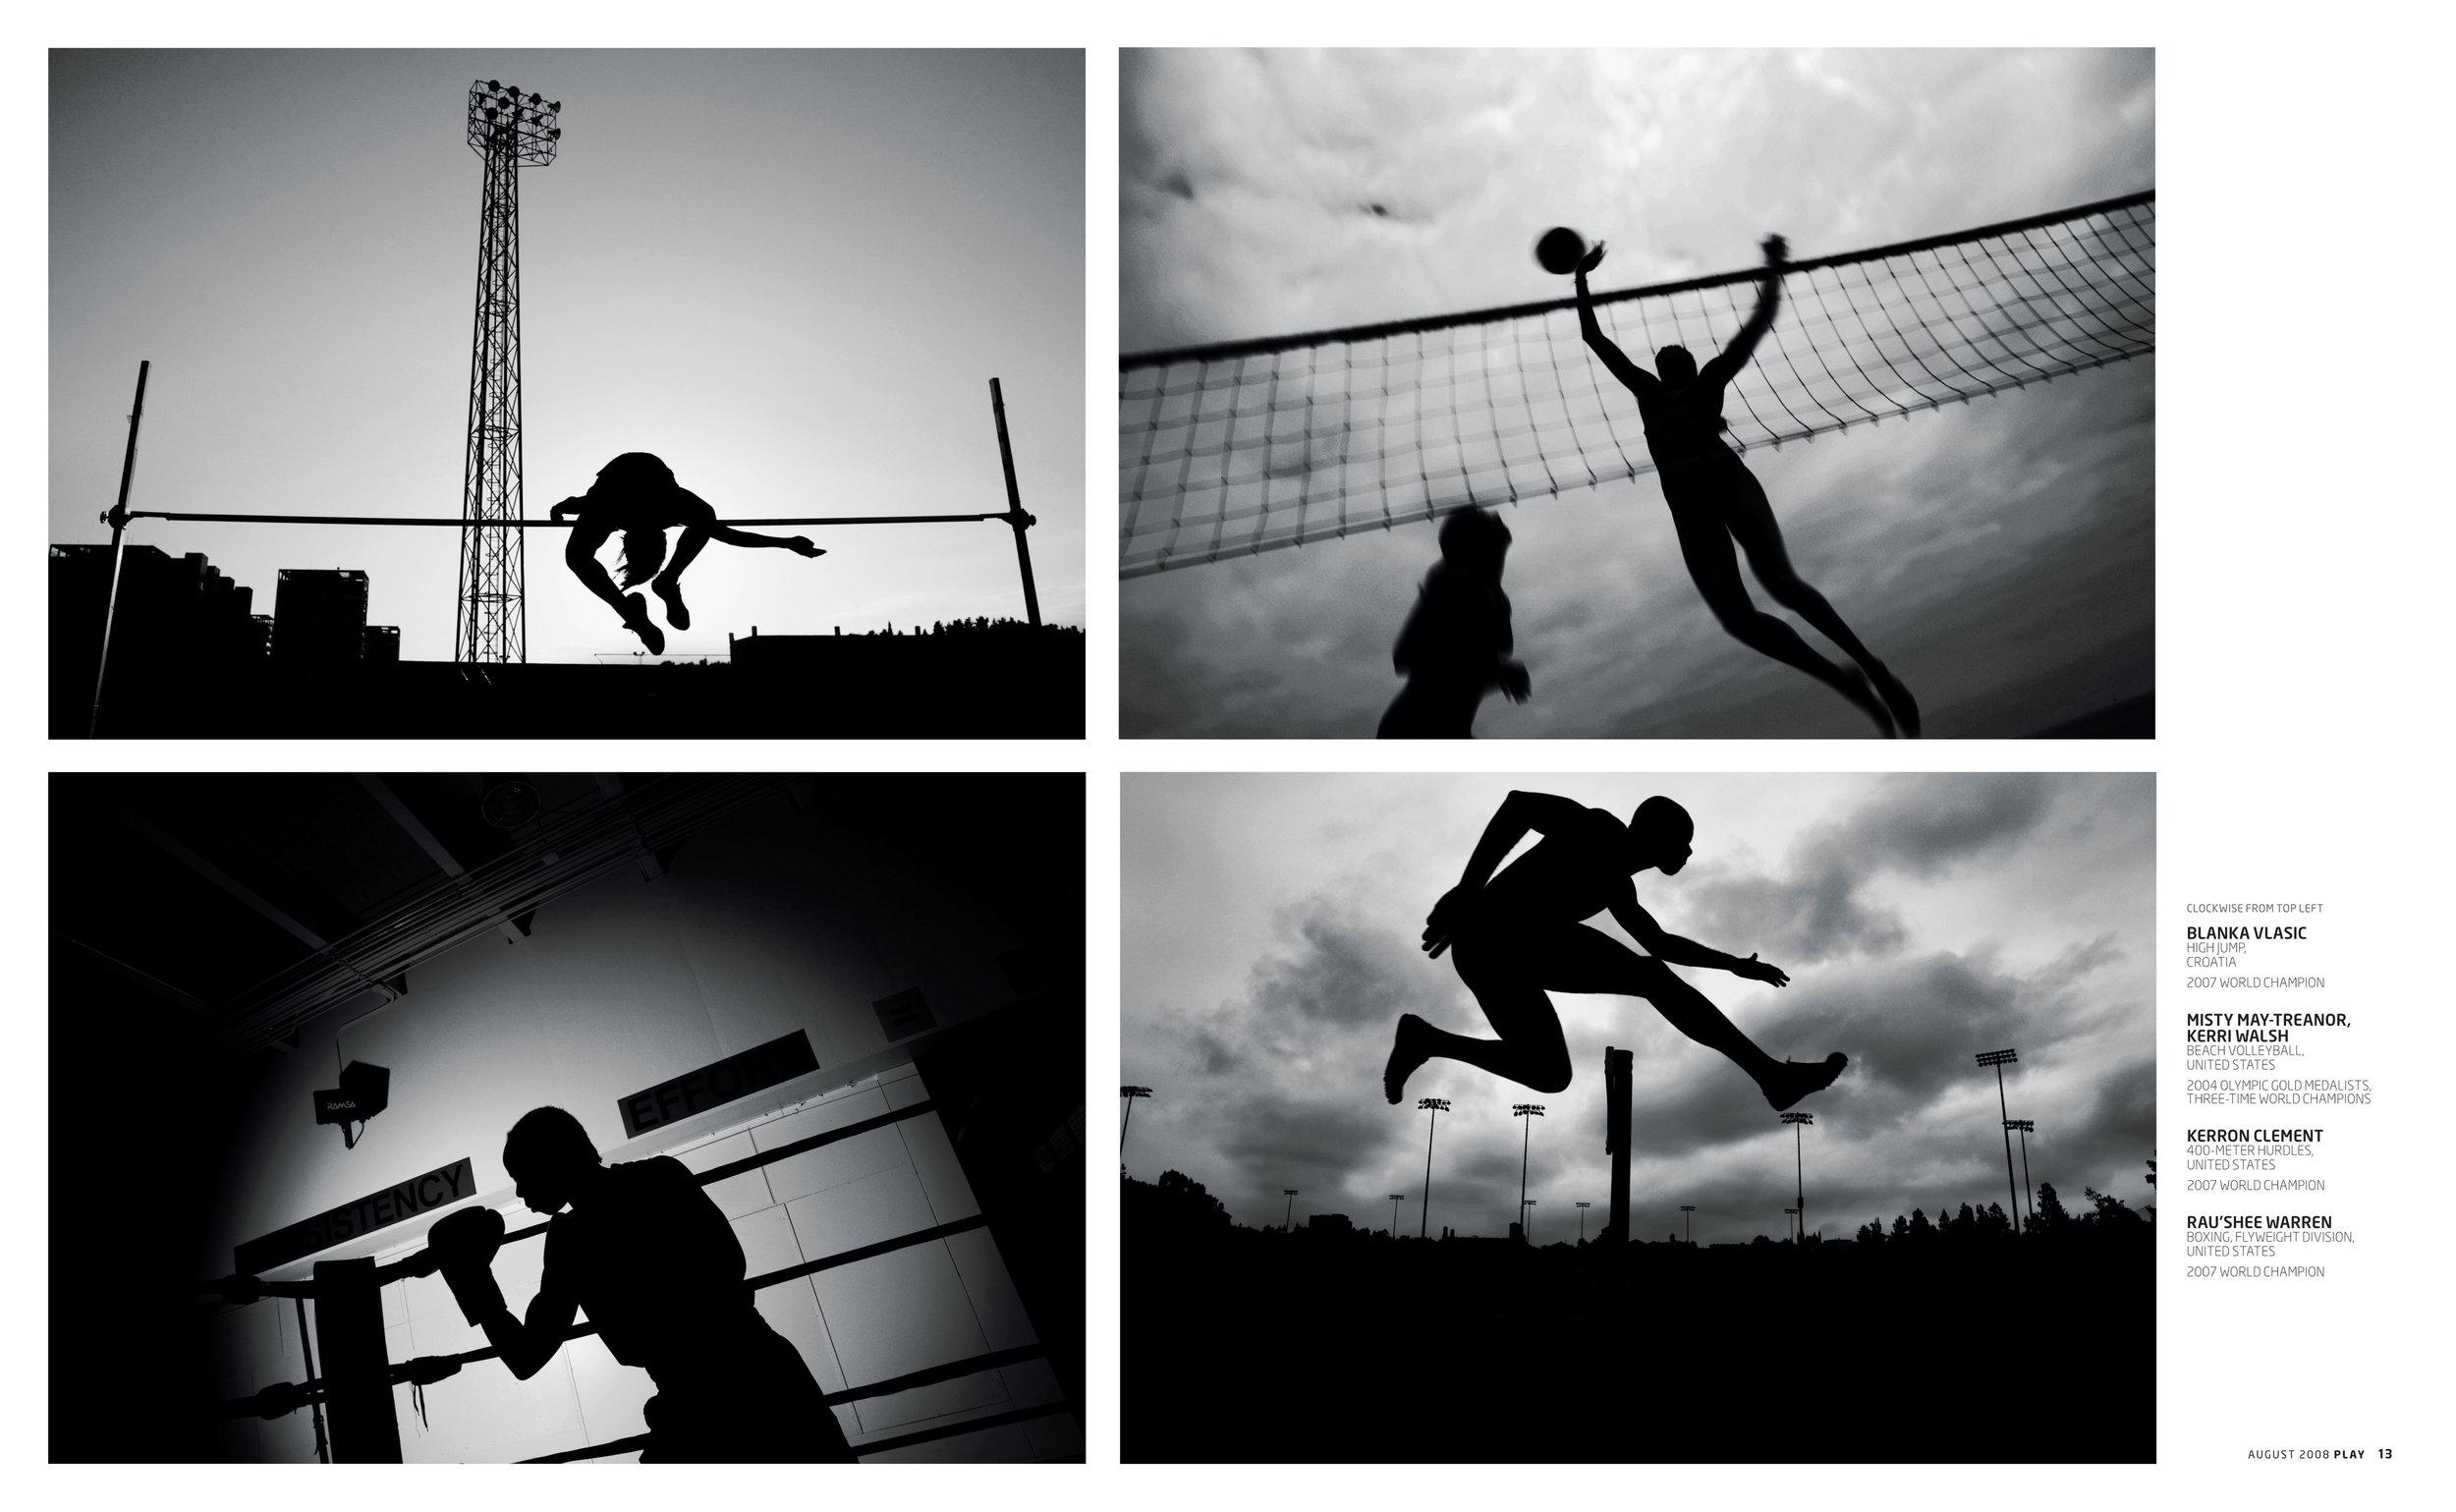 08.03.2008.Olympics.Pellegrin.04.jpg